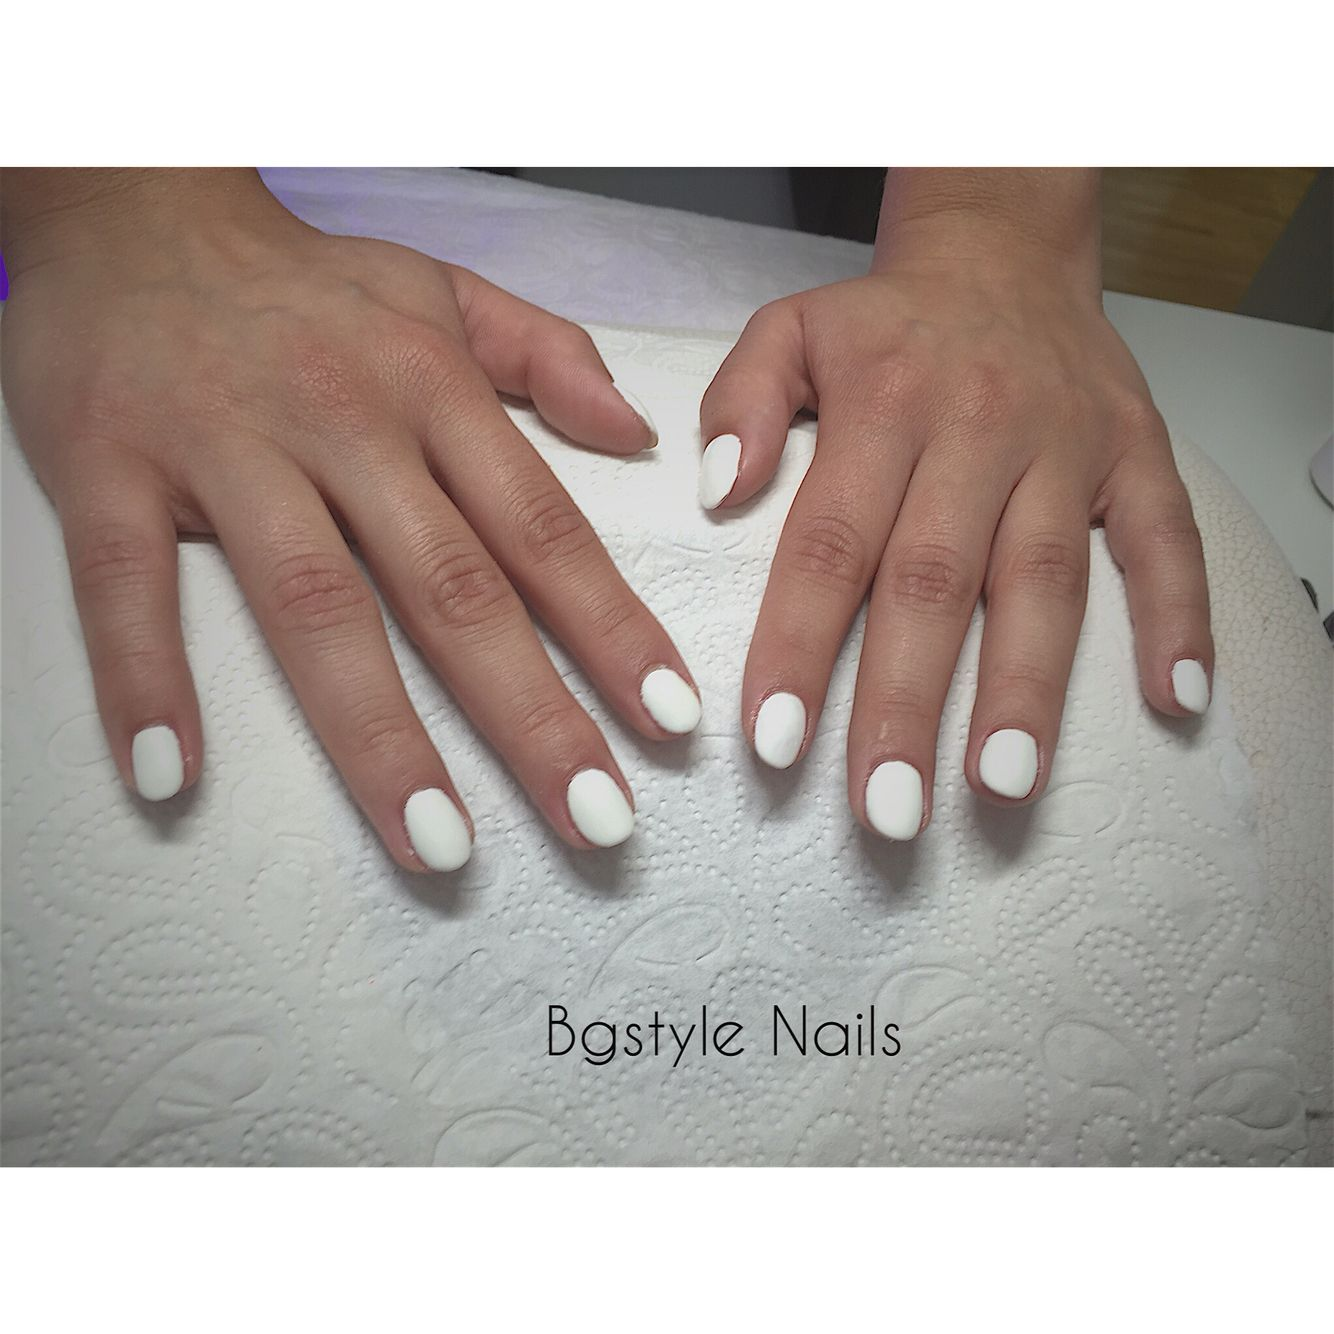 #GelNails #bgstyle_nails_n_jewelry #nails #sparklynails #naildesign #nailsbyme #naildesigns #gelnaegel #naegel #inistagood #ilovenails2016 #lovenails #swarovski #sculptednails #nailsfashion #nailsart #nailart #naillove #nailstyle #nailaddict #nailcouture #mattenails  #nailstoinspire #instanails #bgstyleNails #zürich